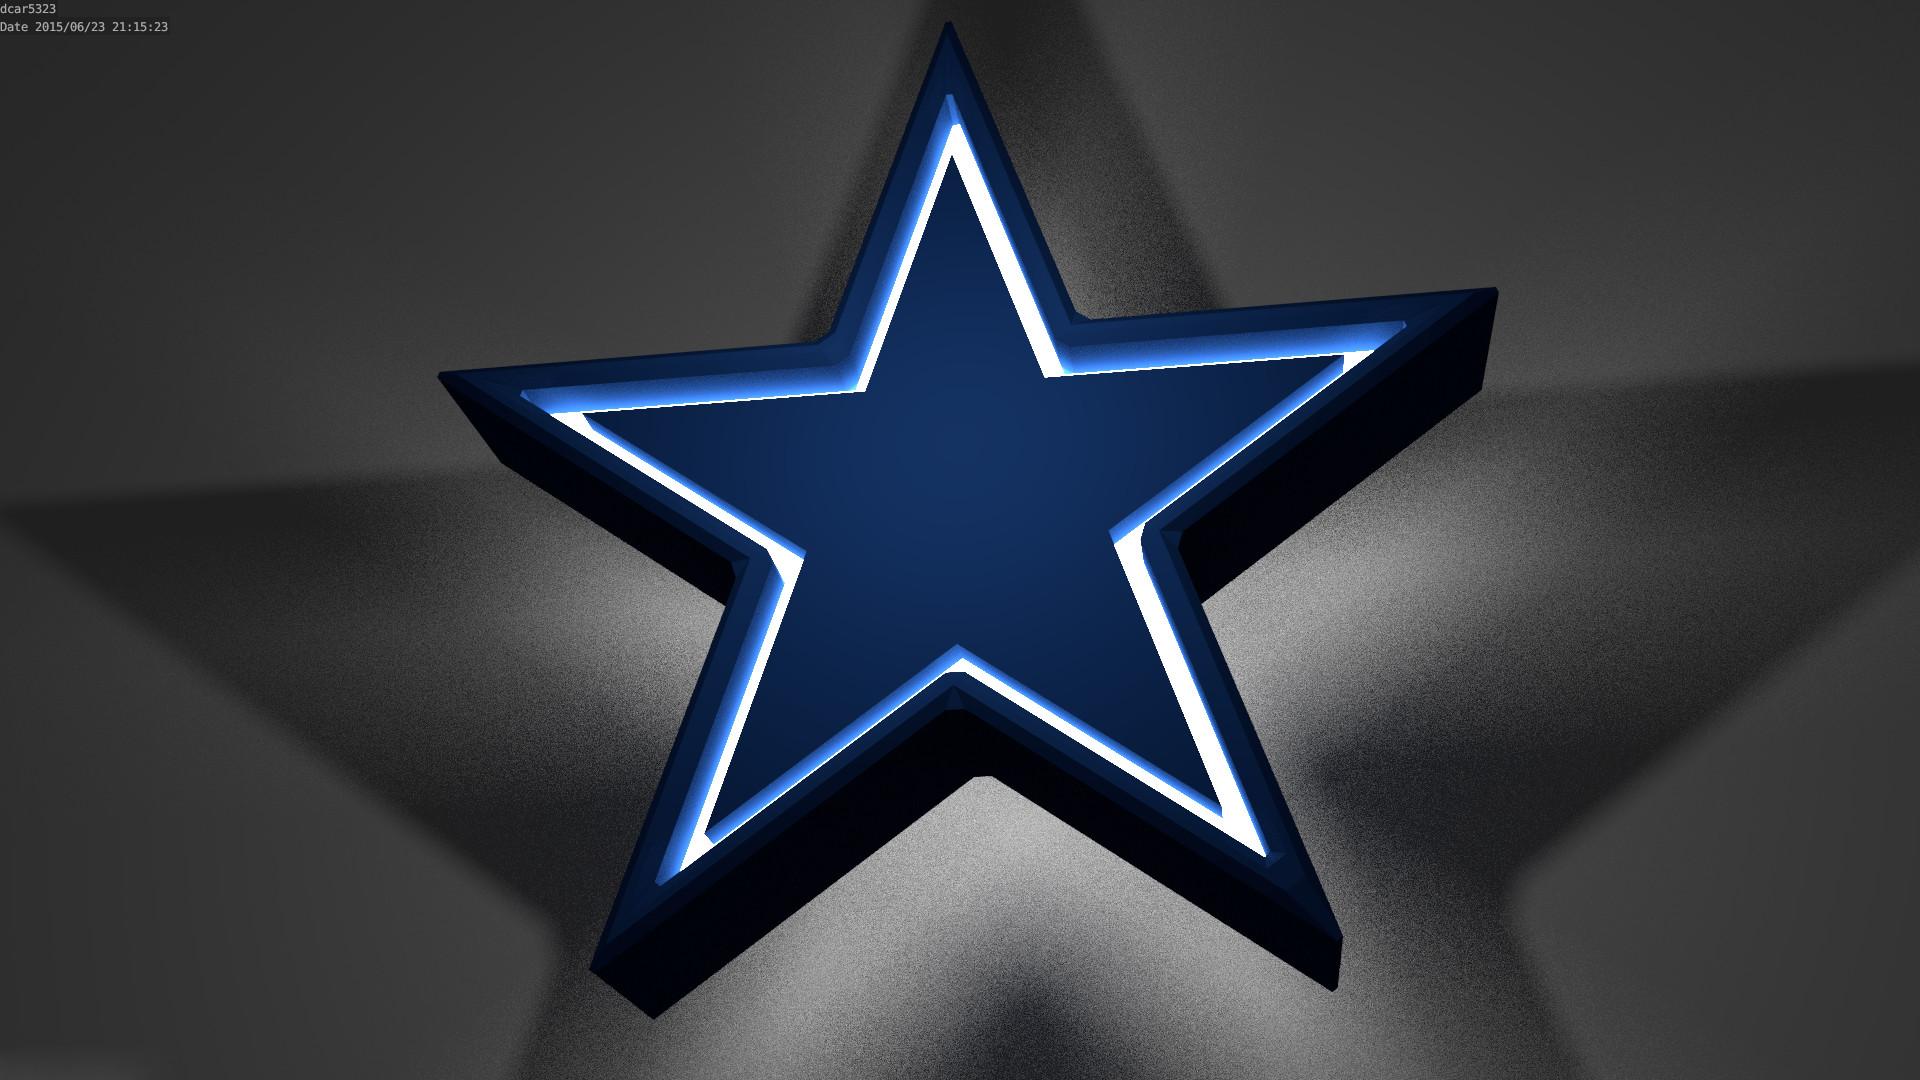 Dallas Cowboy Wallpaper HD For Desktop.